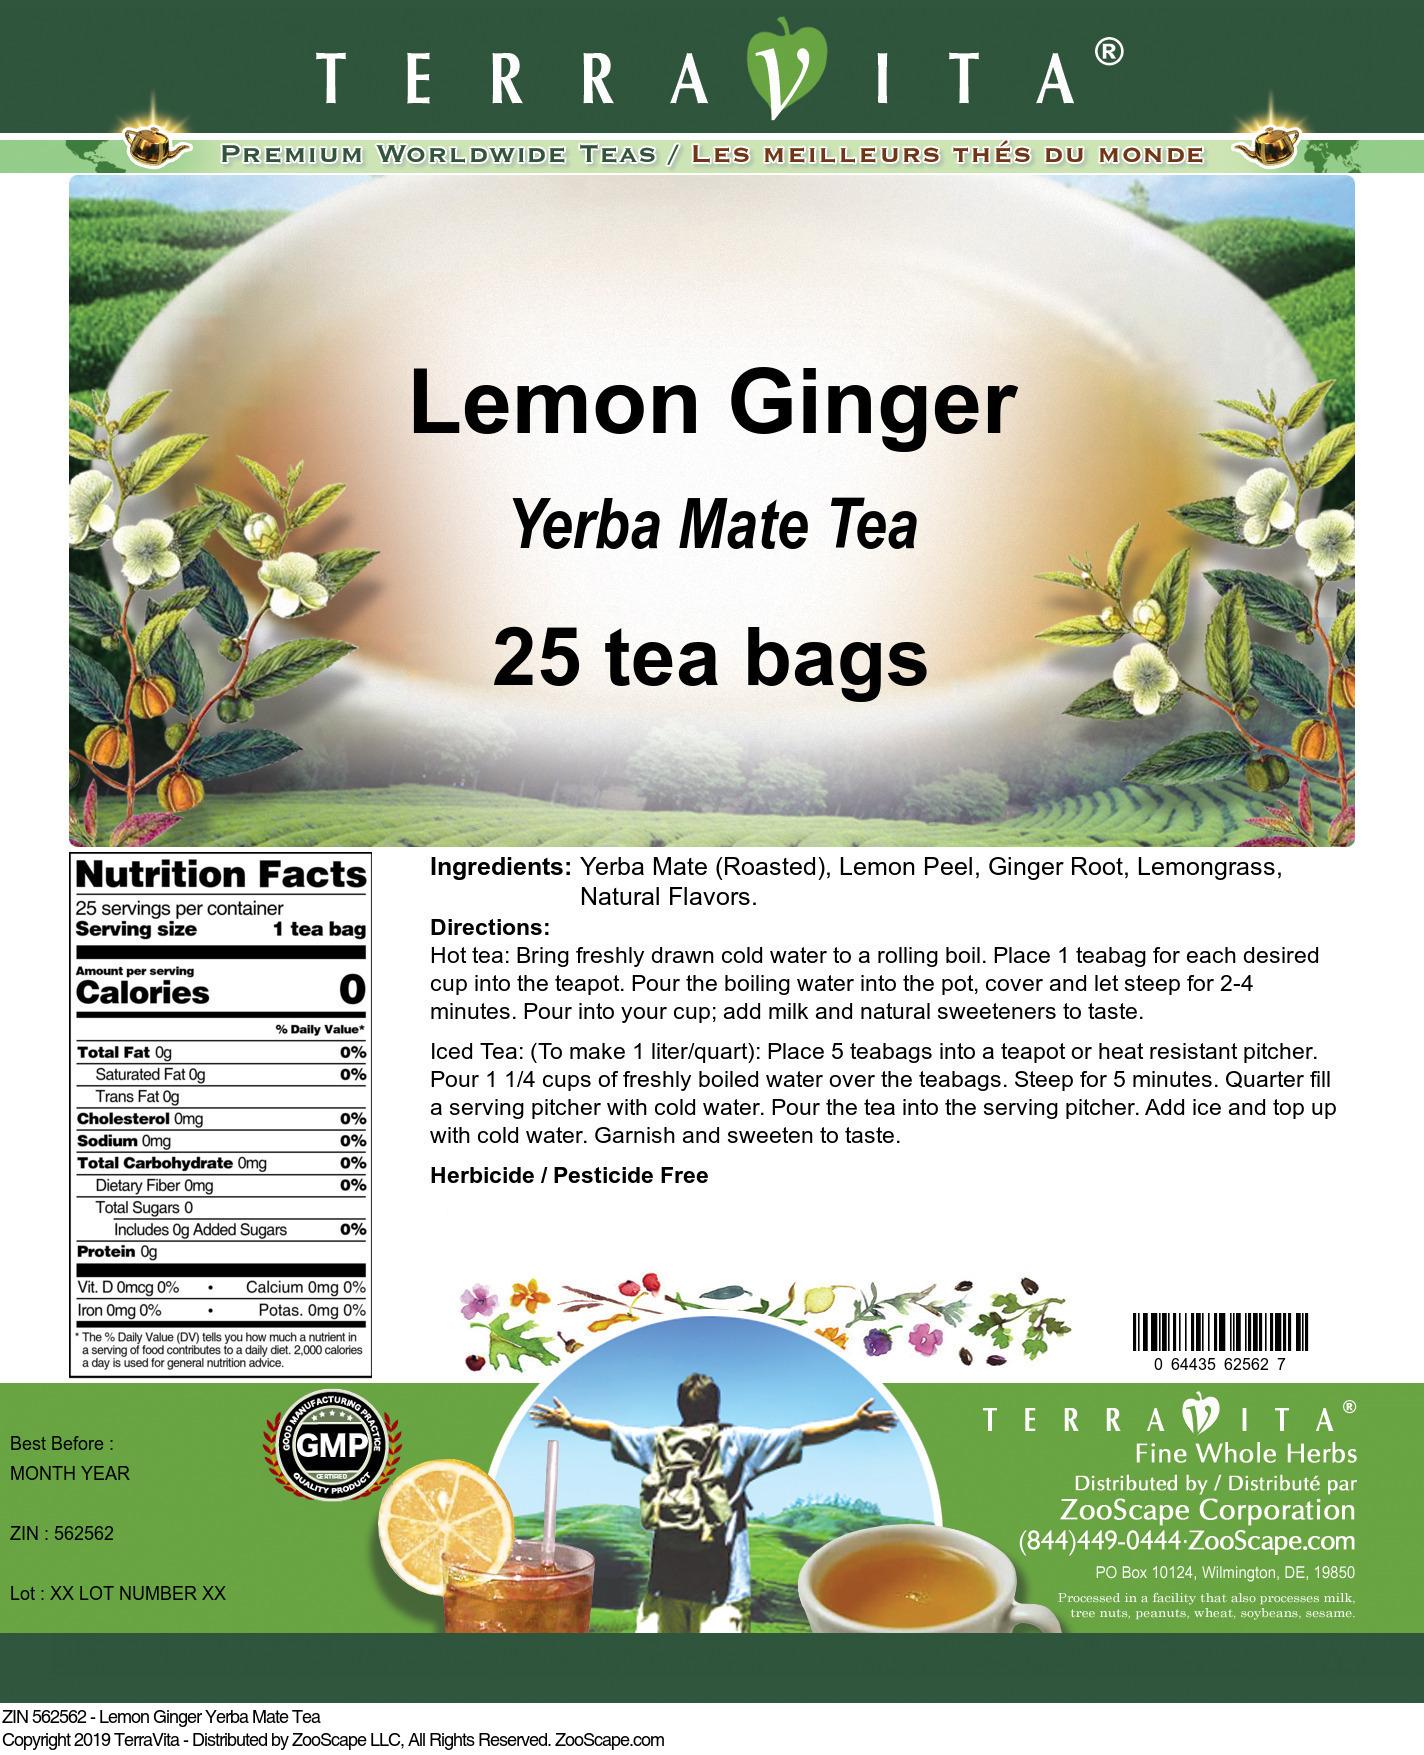 Lemon Ginger Yerba Mate Tea